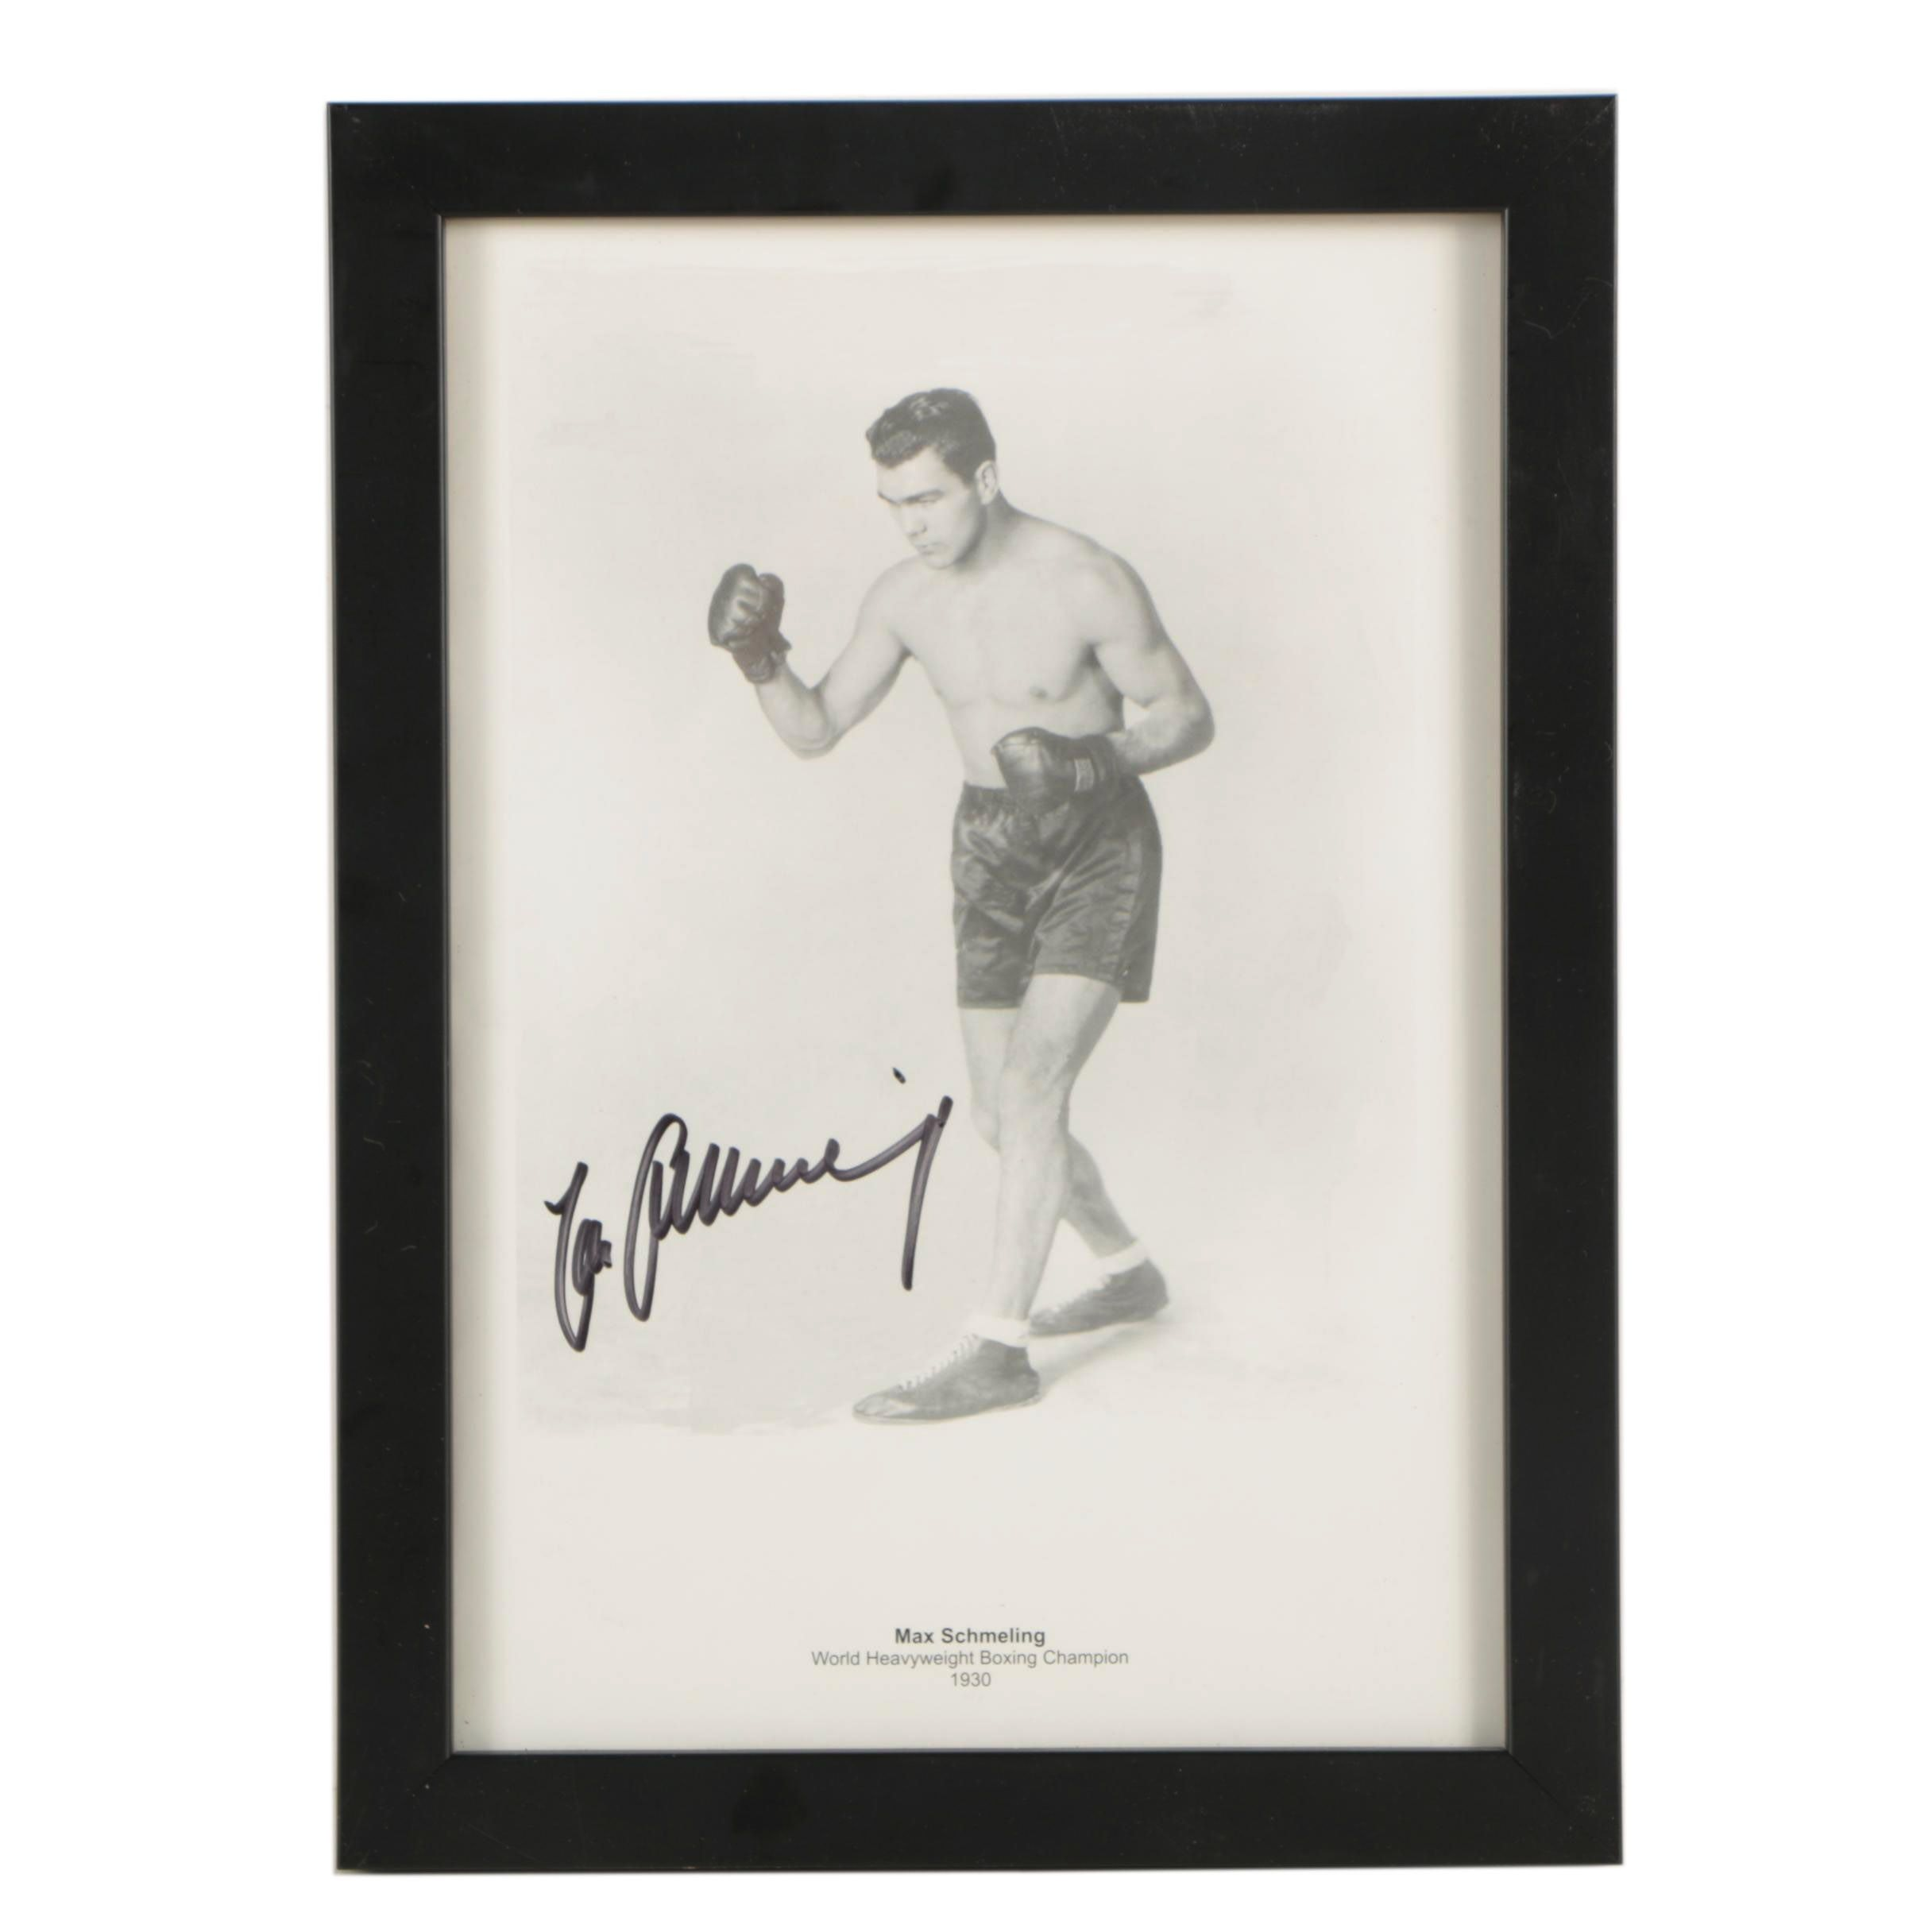 Max Schmeling Autographed Print